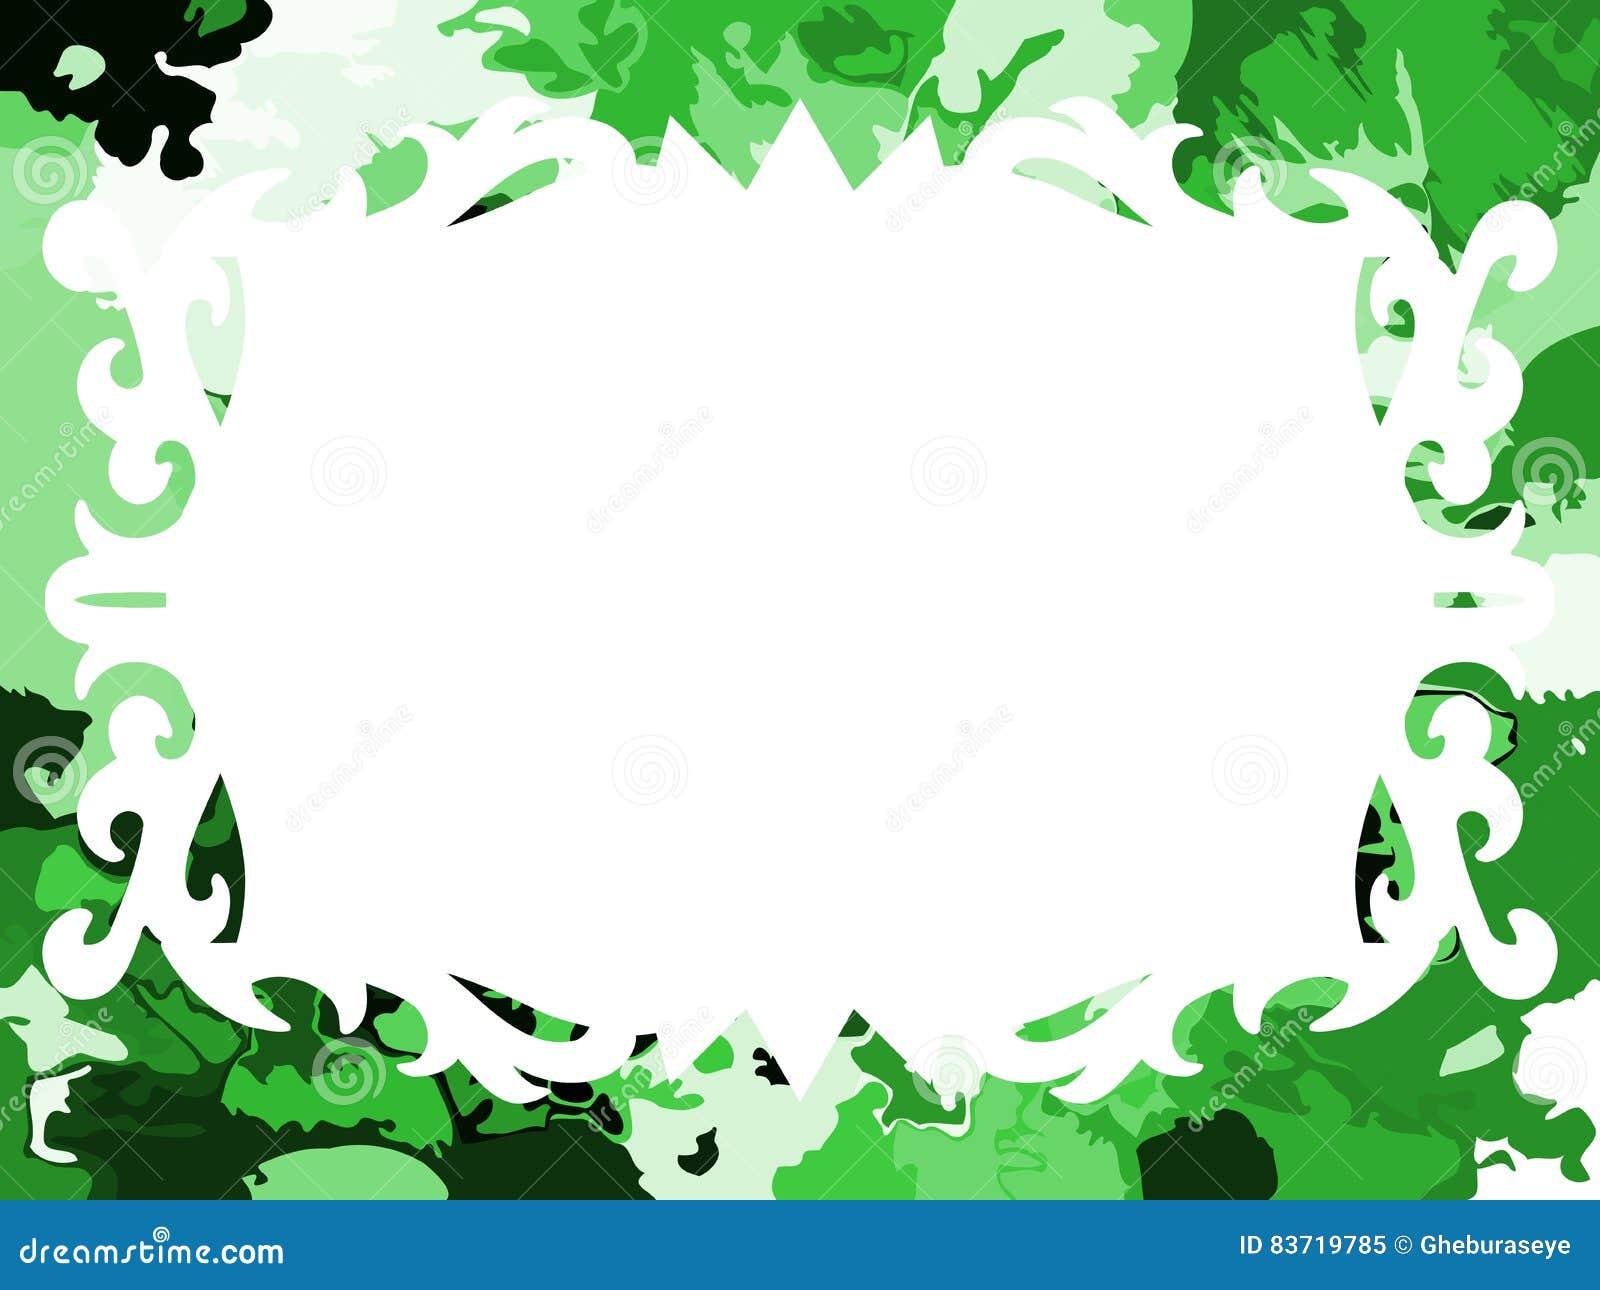 Artistic Elegant Frame In Green Tones Isolated Stock Vector